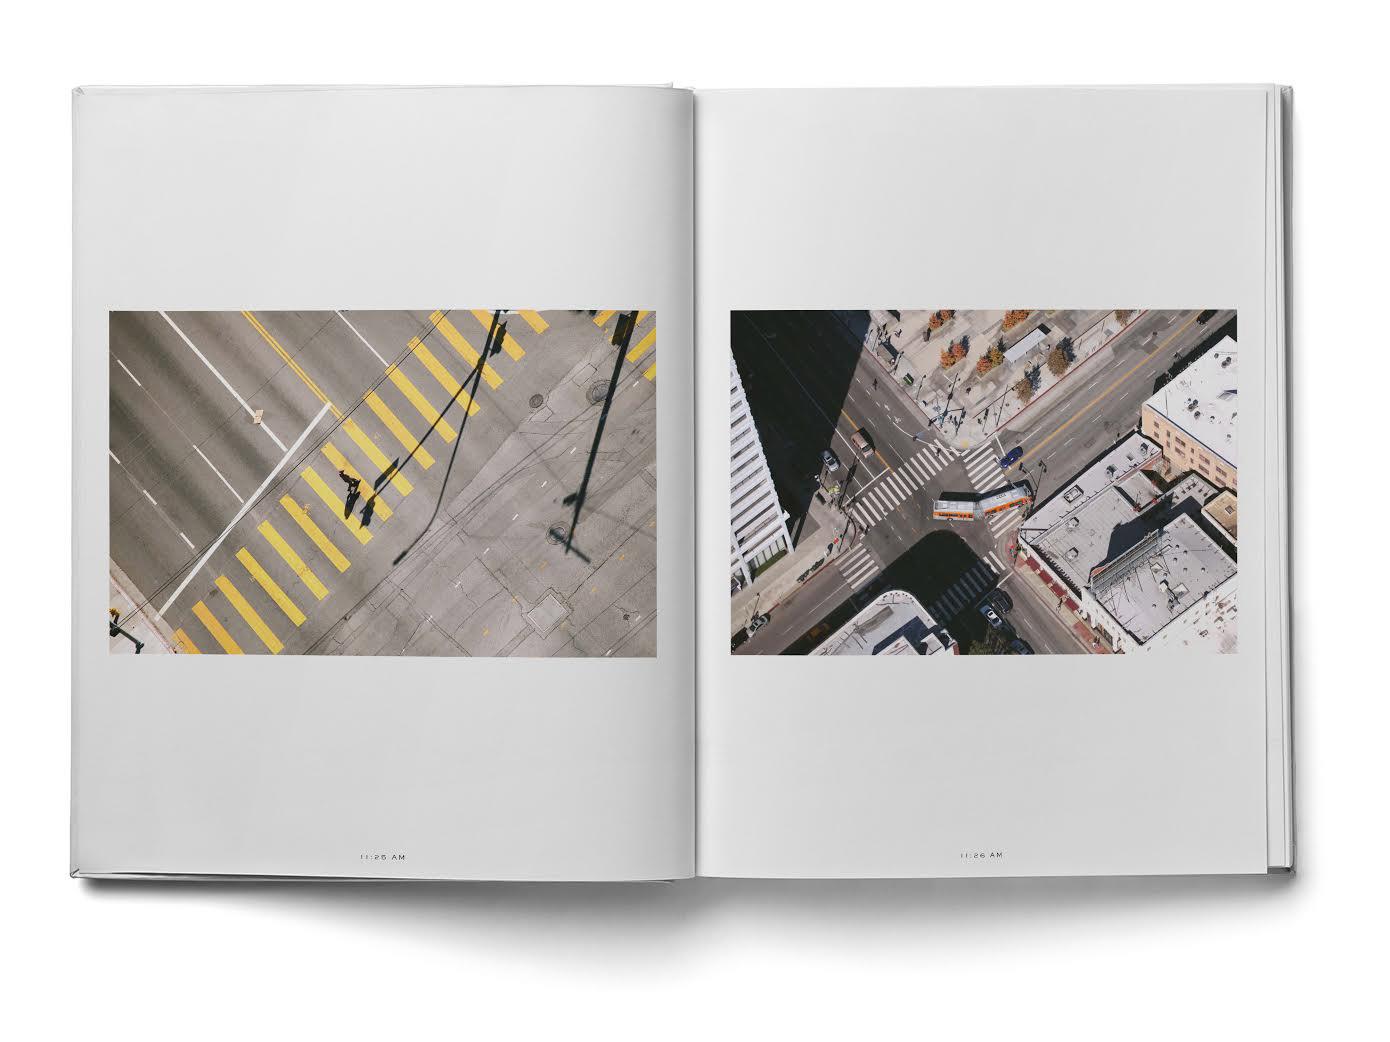 karlhab-24hlosangeles-book-2